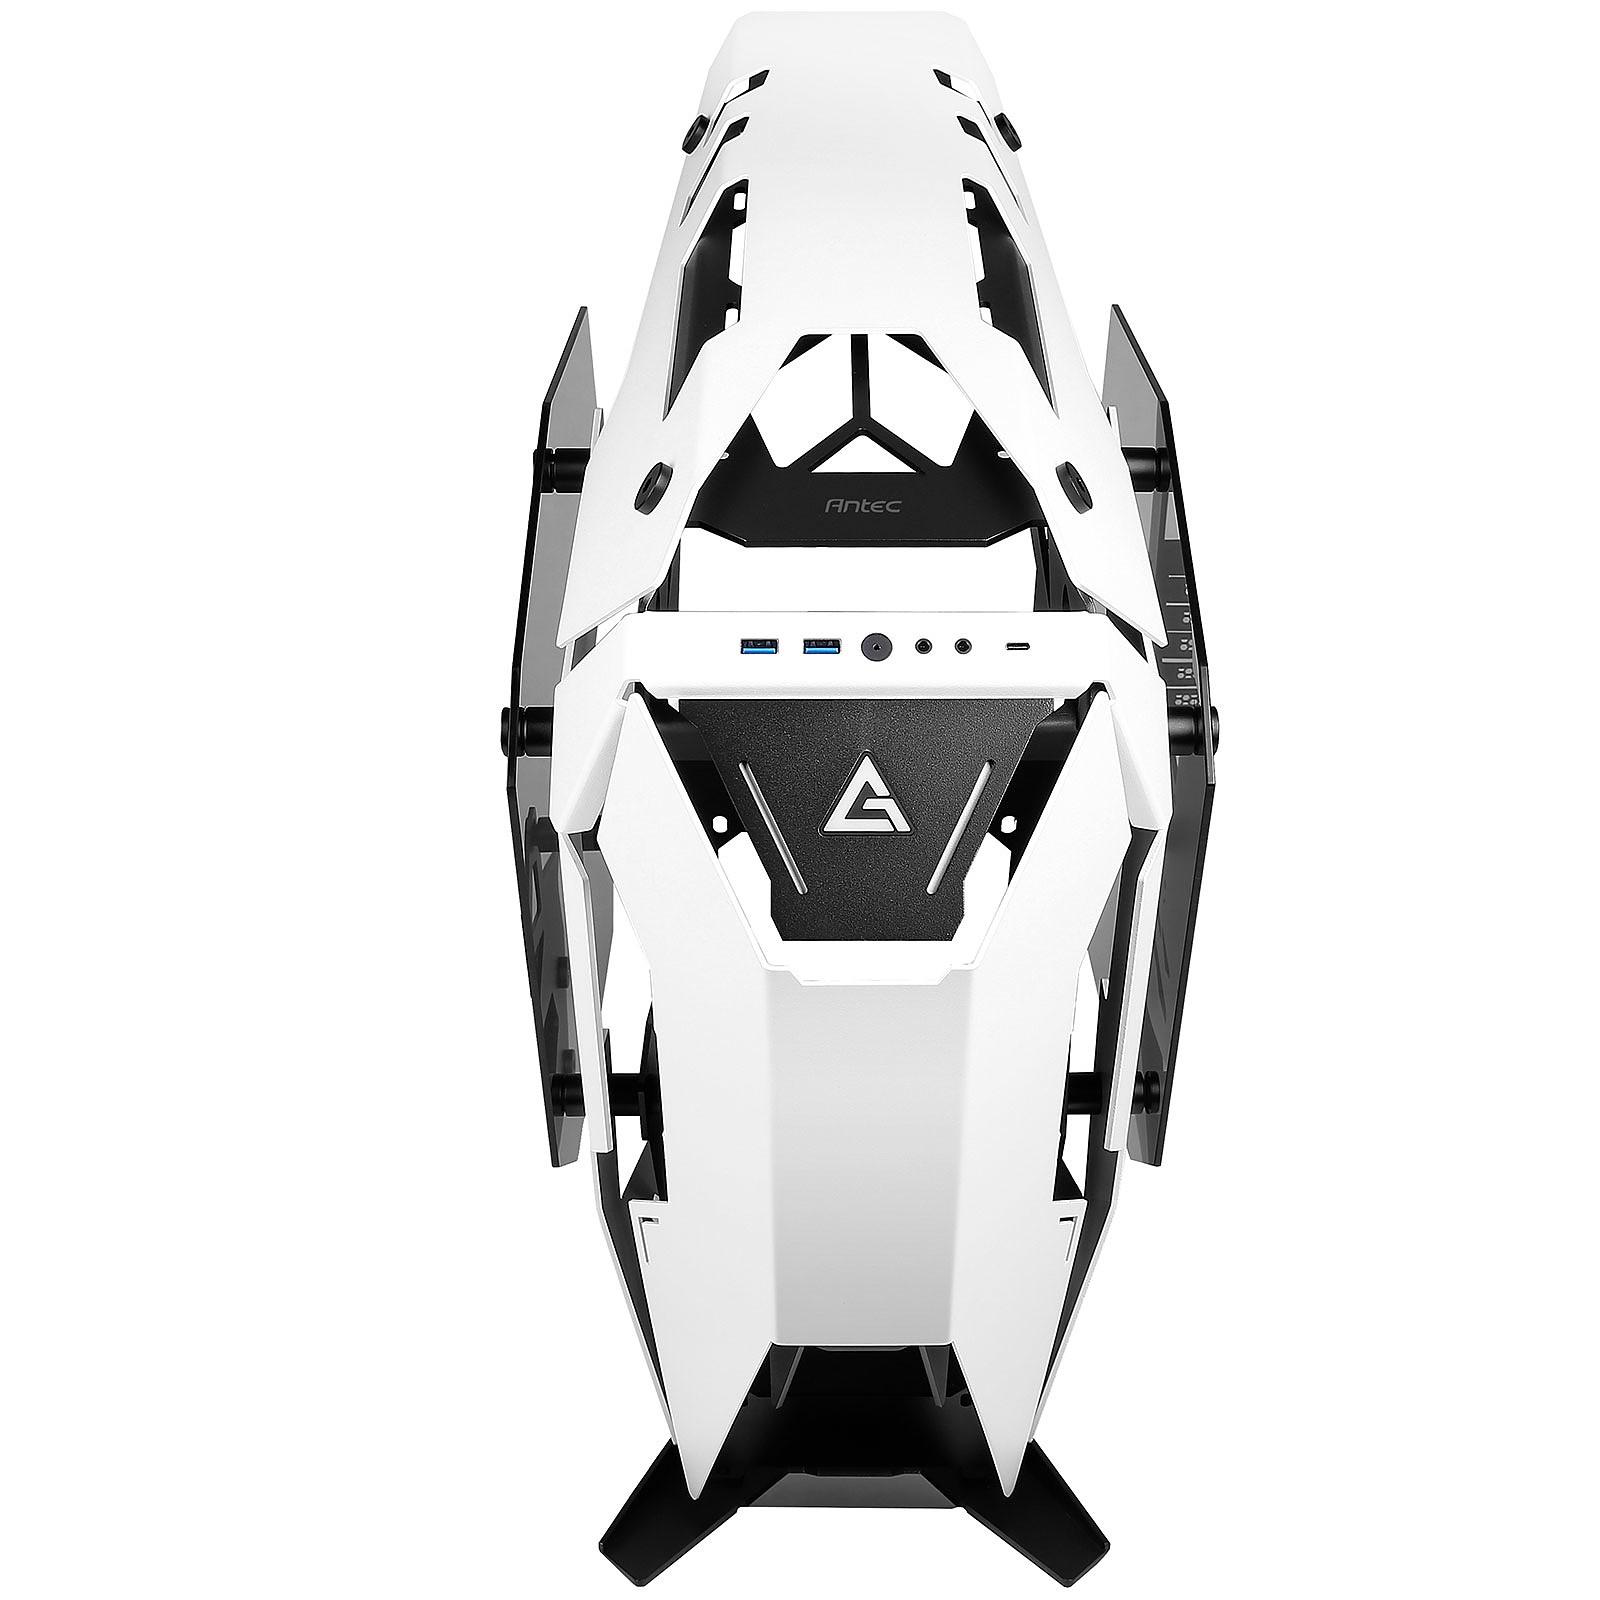 Antec TORQUE Black/White Blanc - Boîtier PC Antec - Cybertek.fr - 4